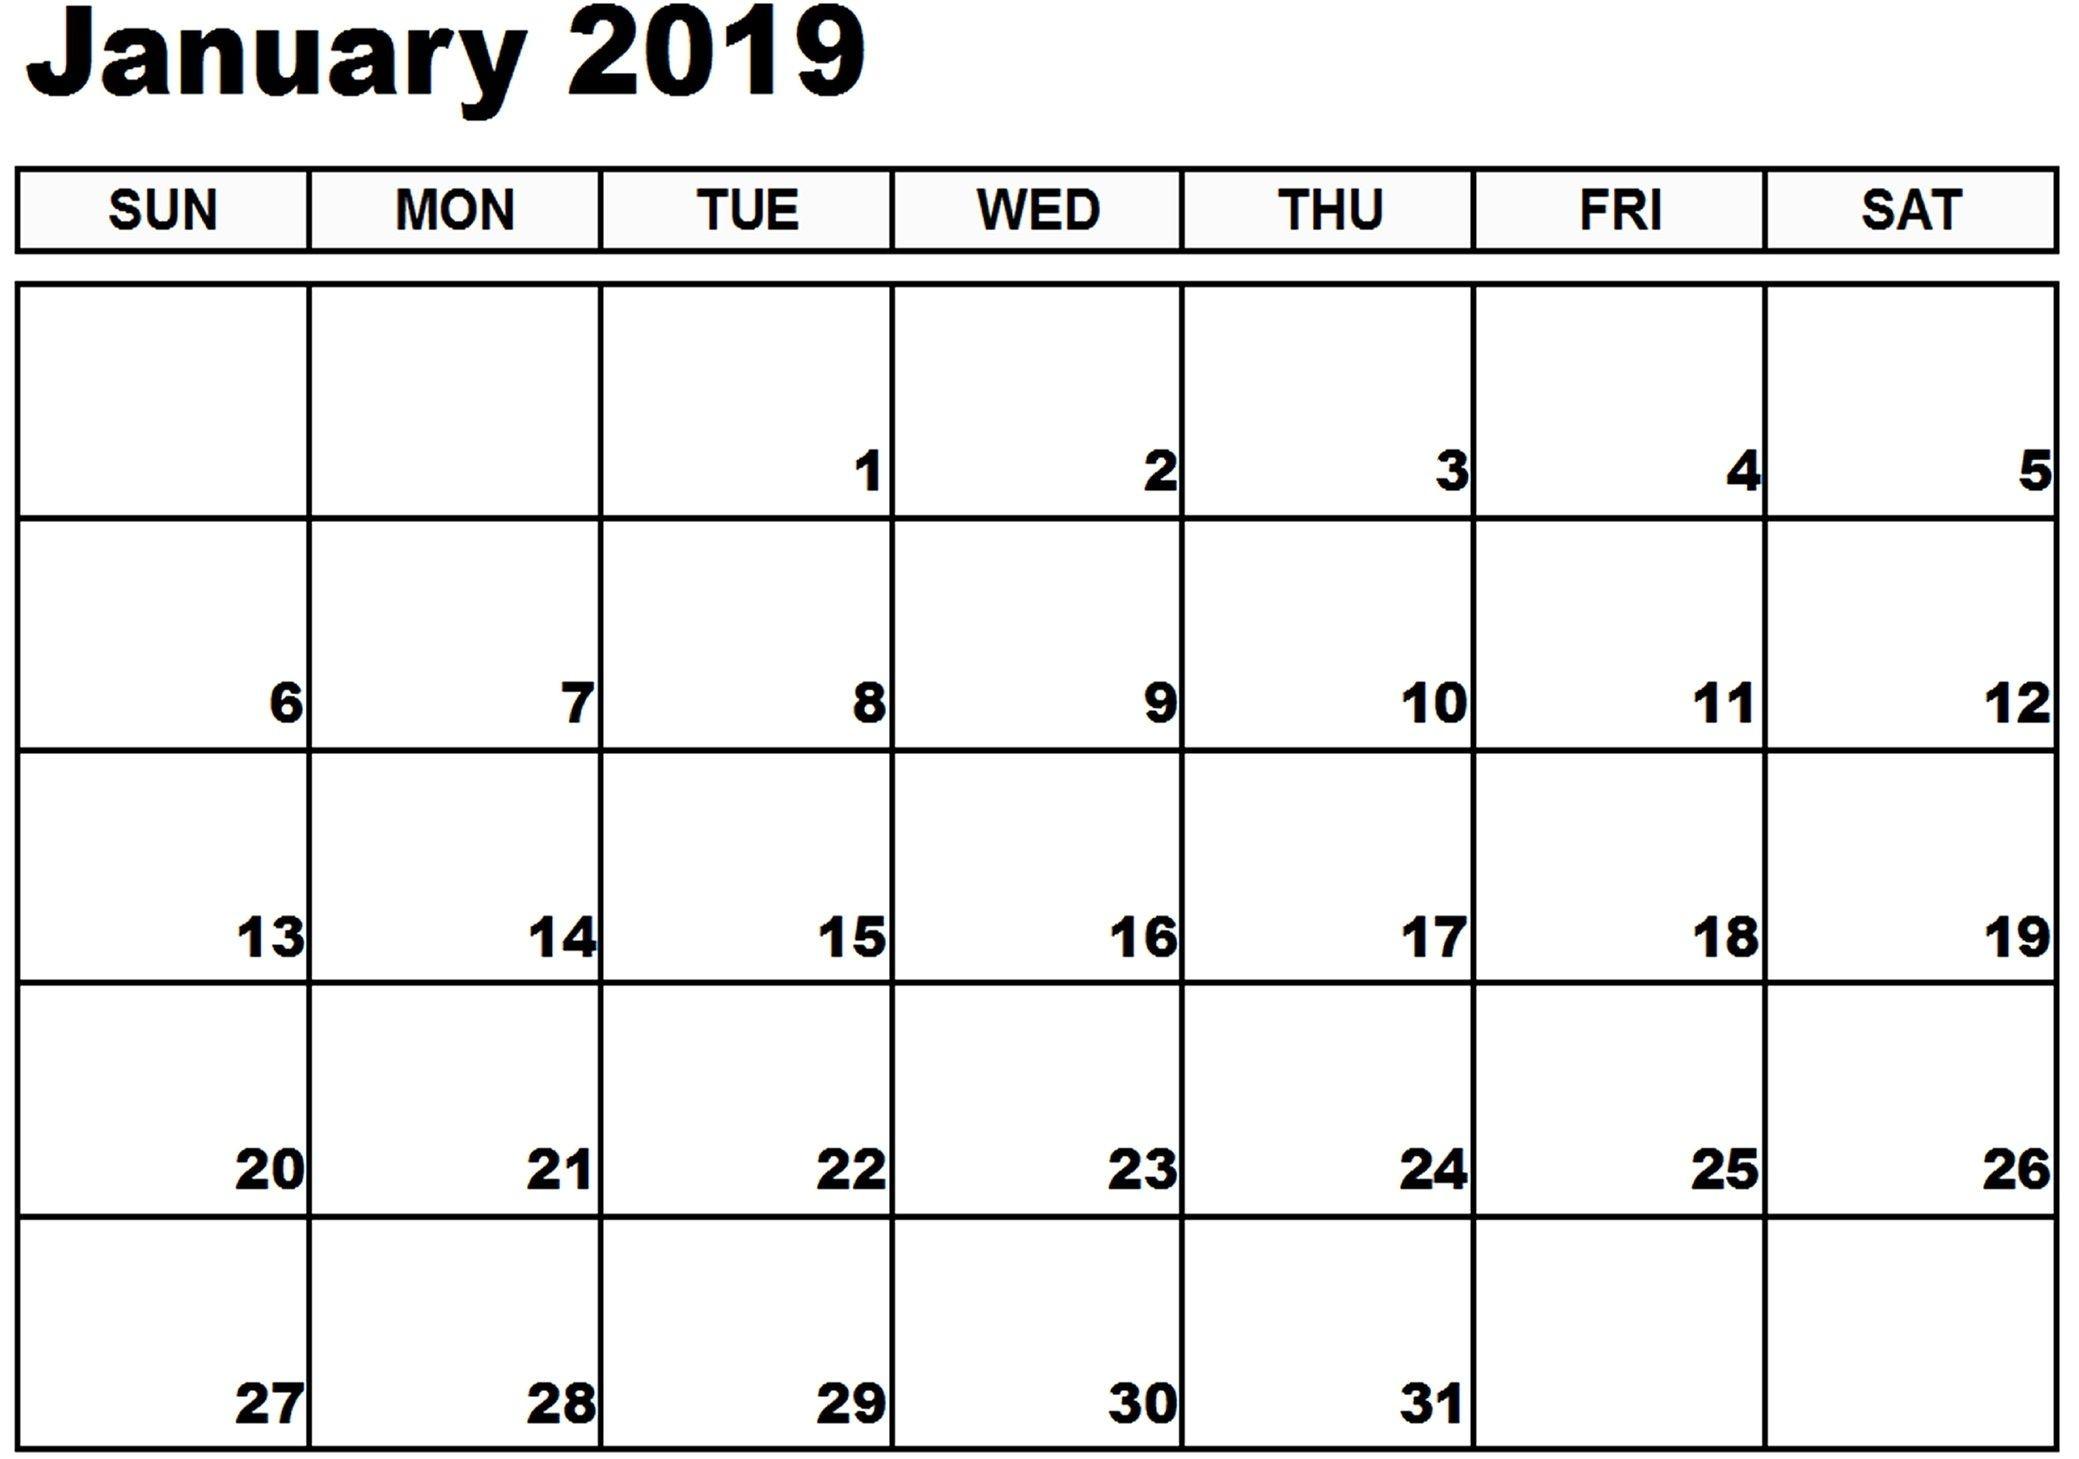 January 2019 Calendar Printable Pdf January 2019 Calendar Xls Printable Calendar